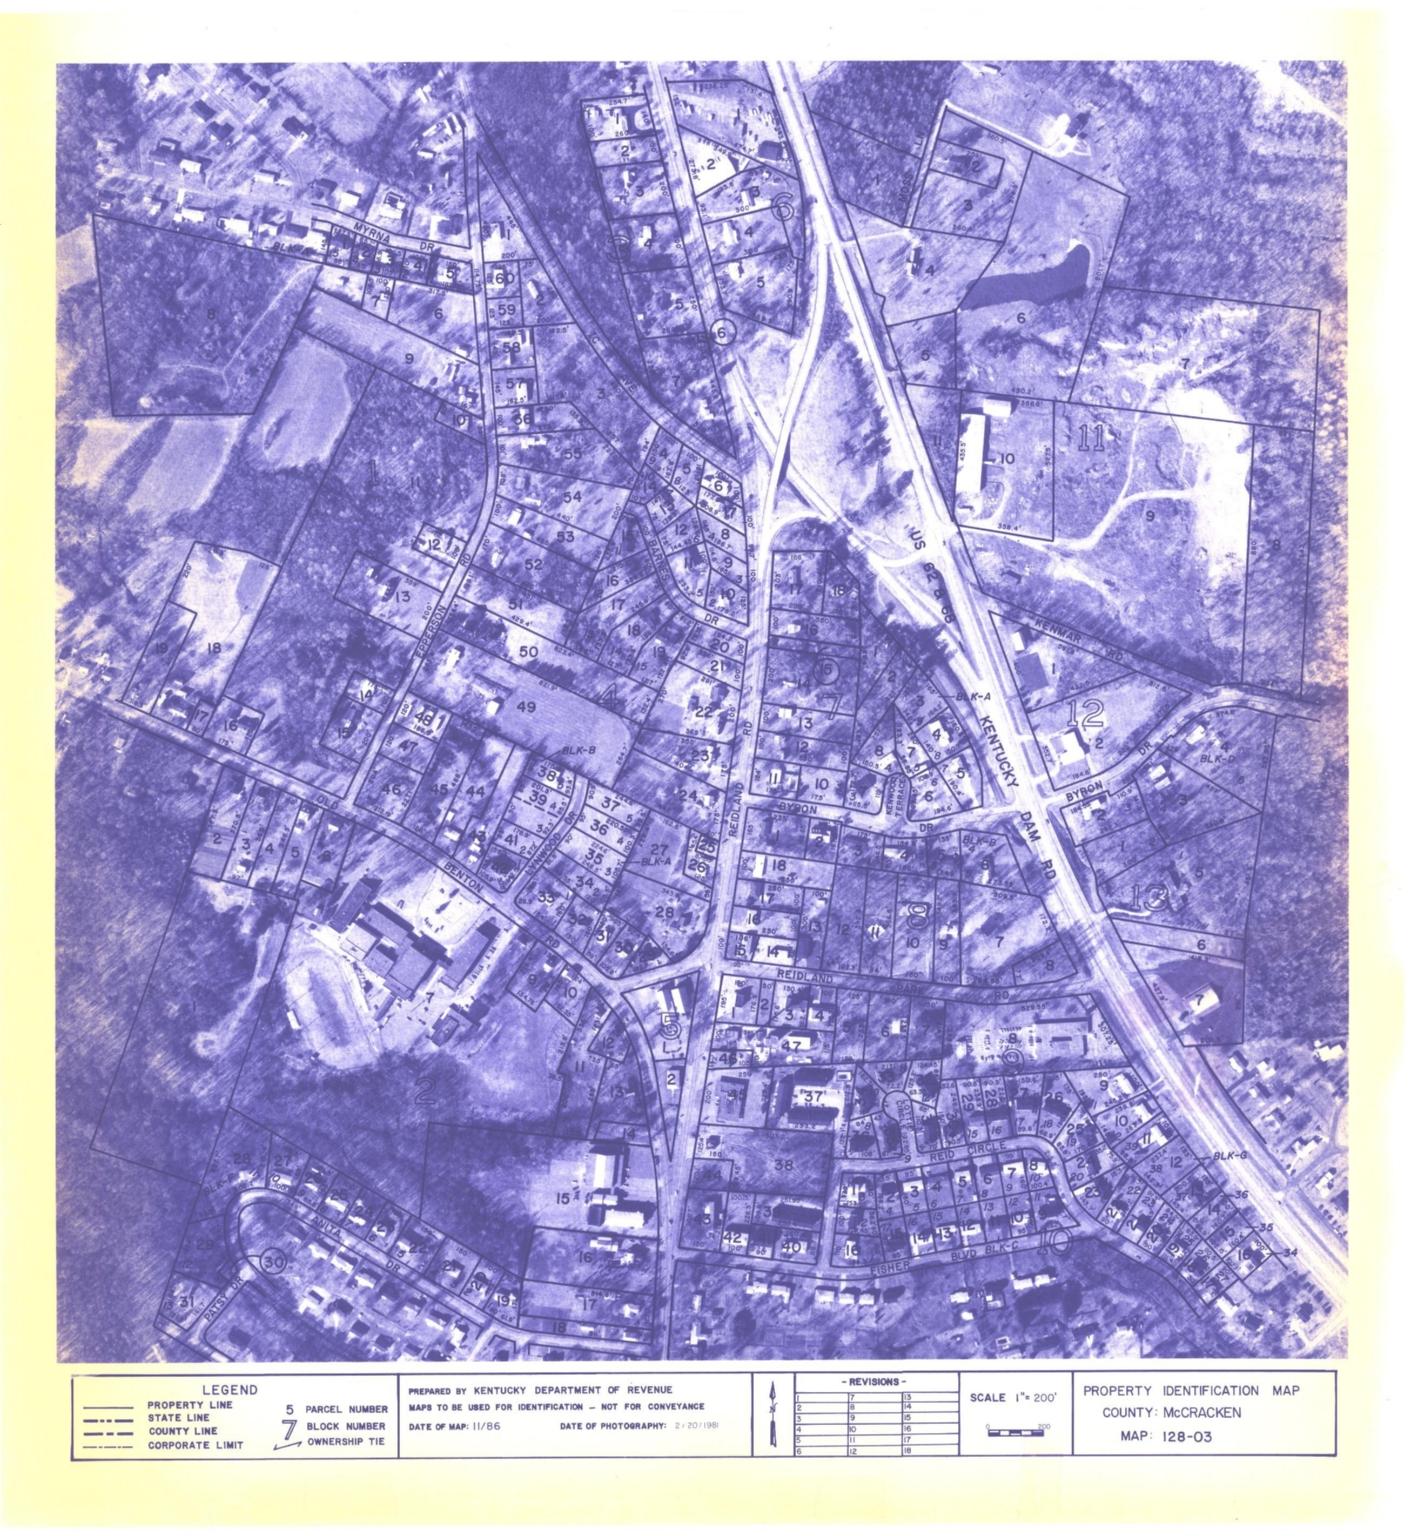 Property Identification Map McCracken County, Map 128-03